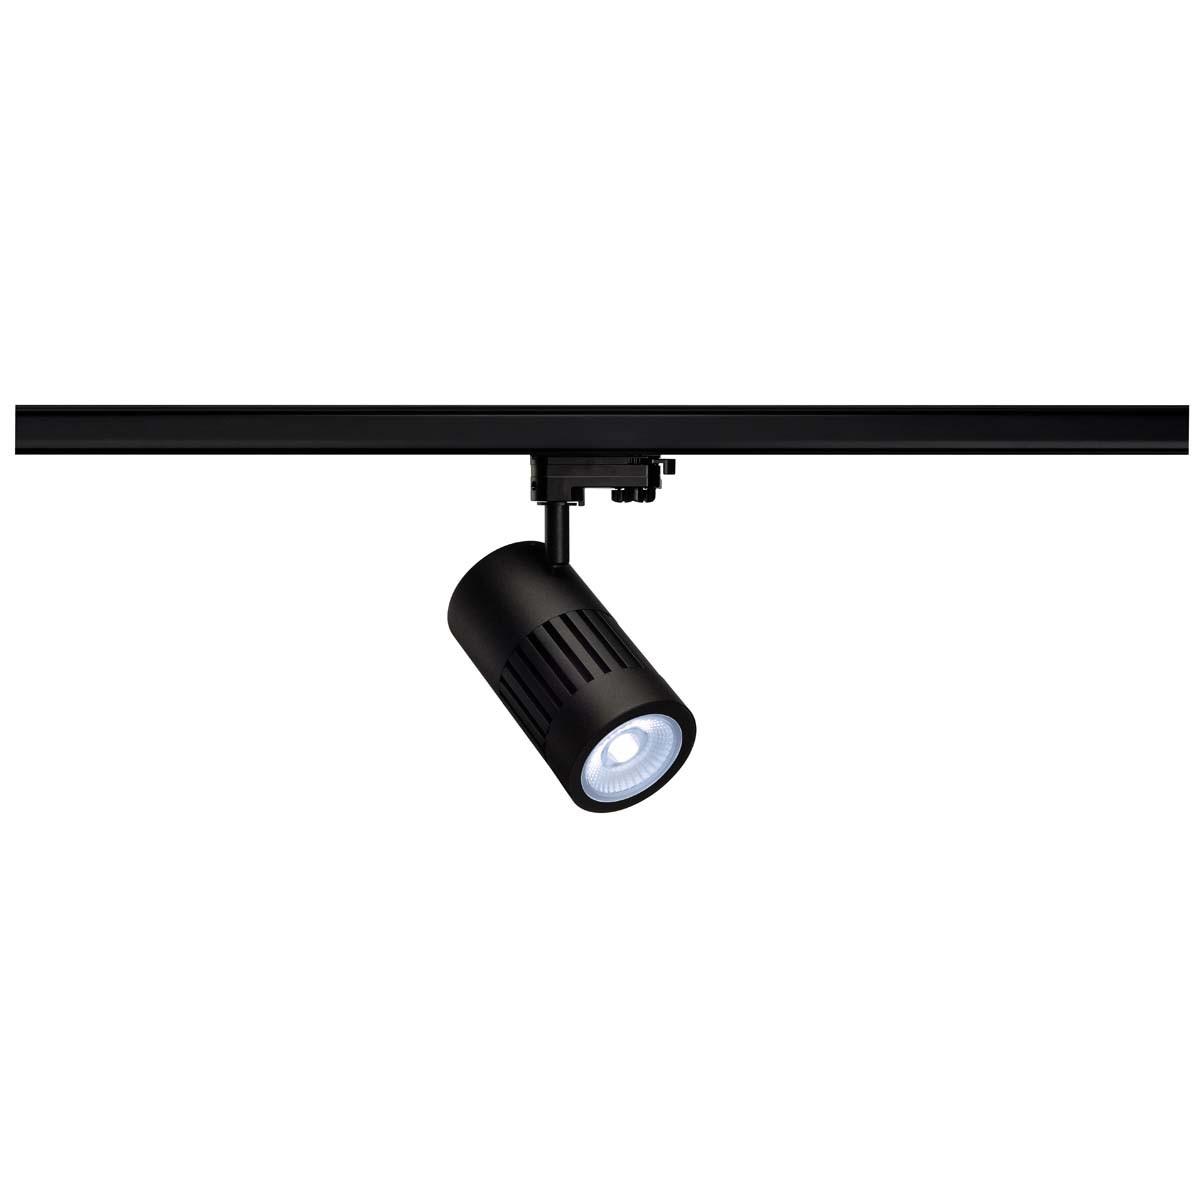 SLV 176070 STRUCTEC LED 30W, round, black , 4000K, 60°, incl. 3-phase adapter